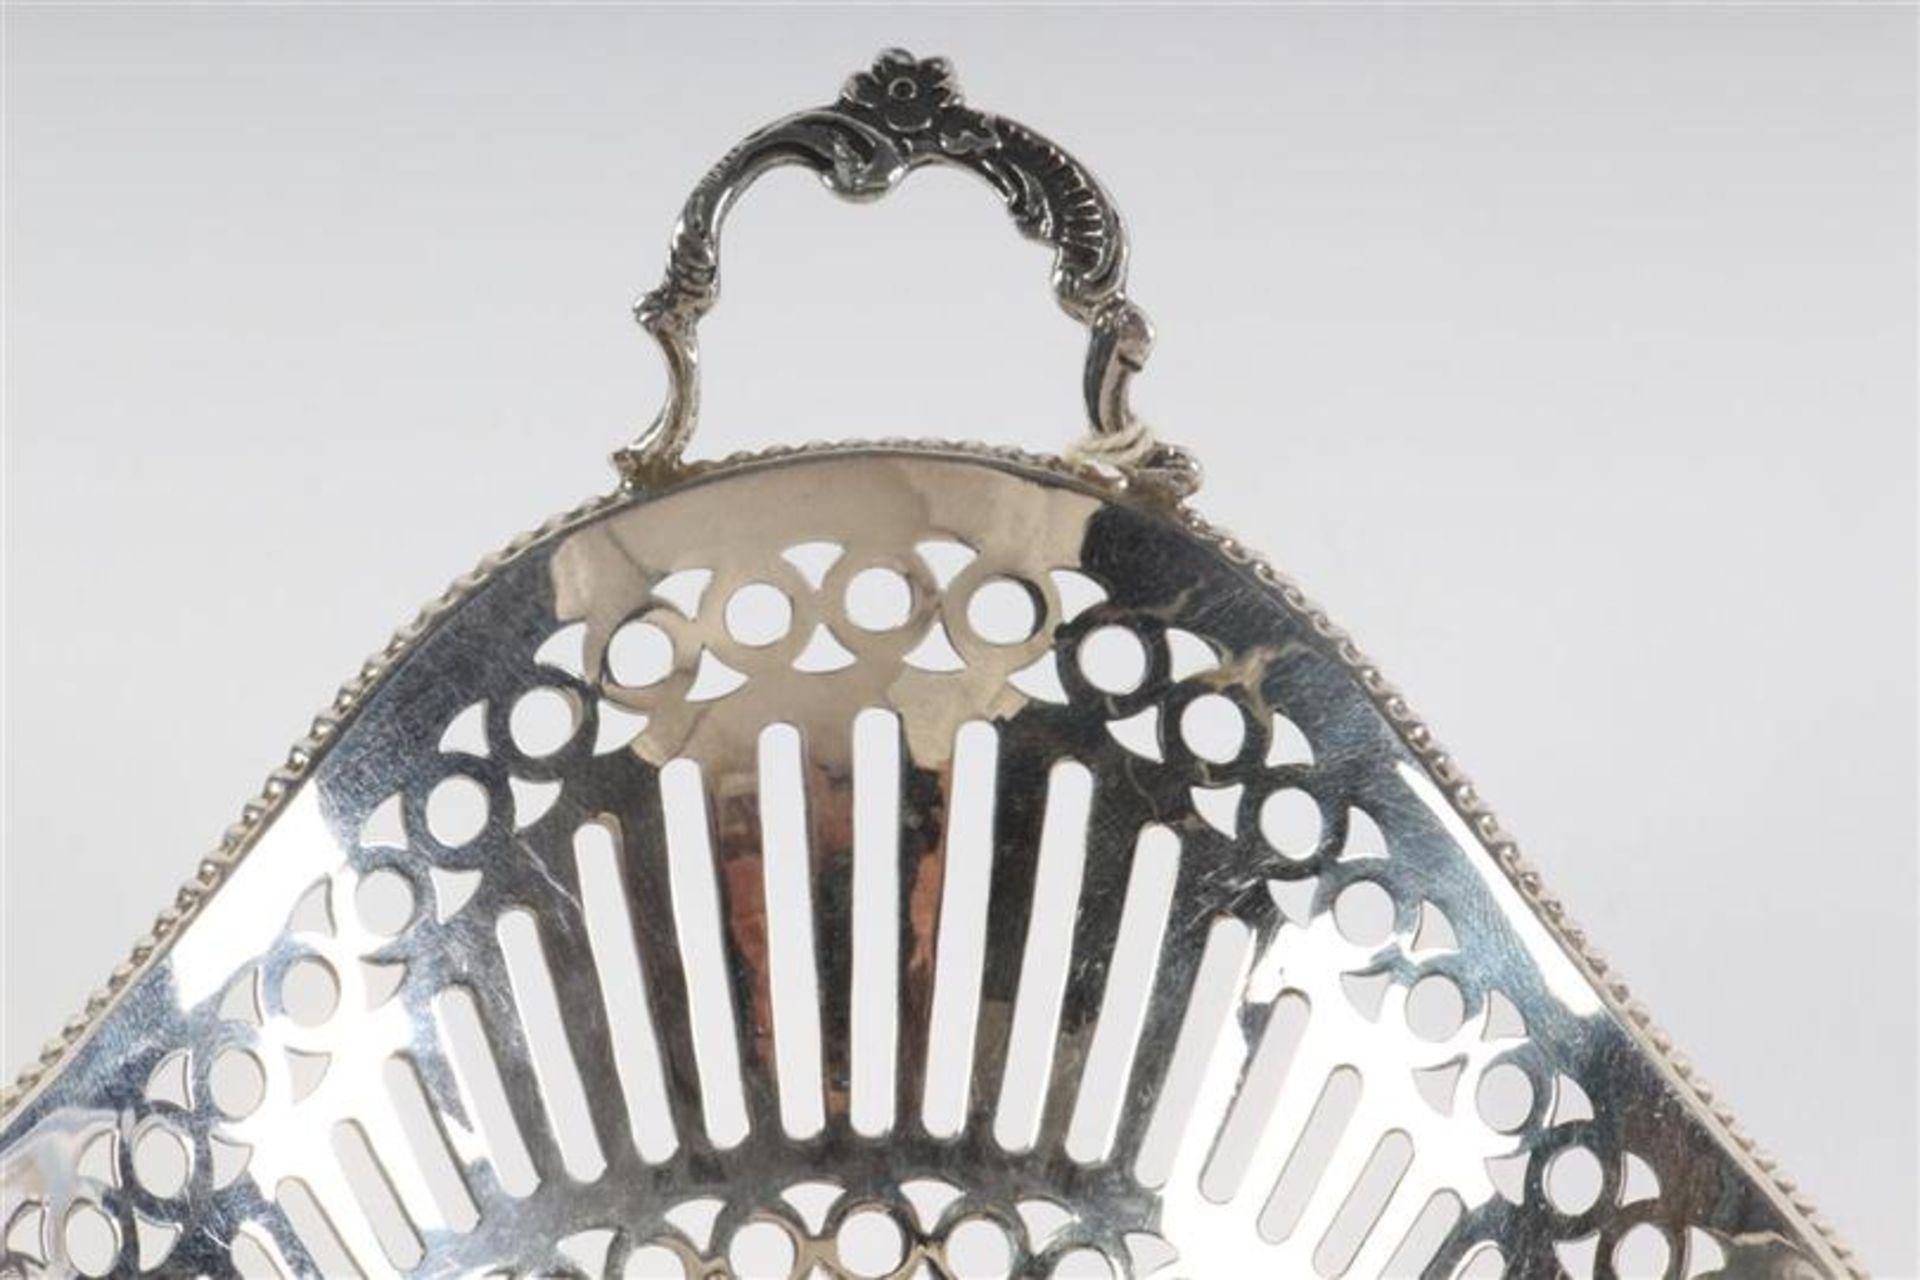 Zilveren bonbonmandje met parelrand, Holland, 20e eeuw. L: 16 cm. Gewicht: 82 g. - Bild 3 aus 4